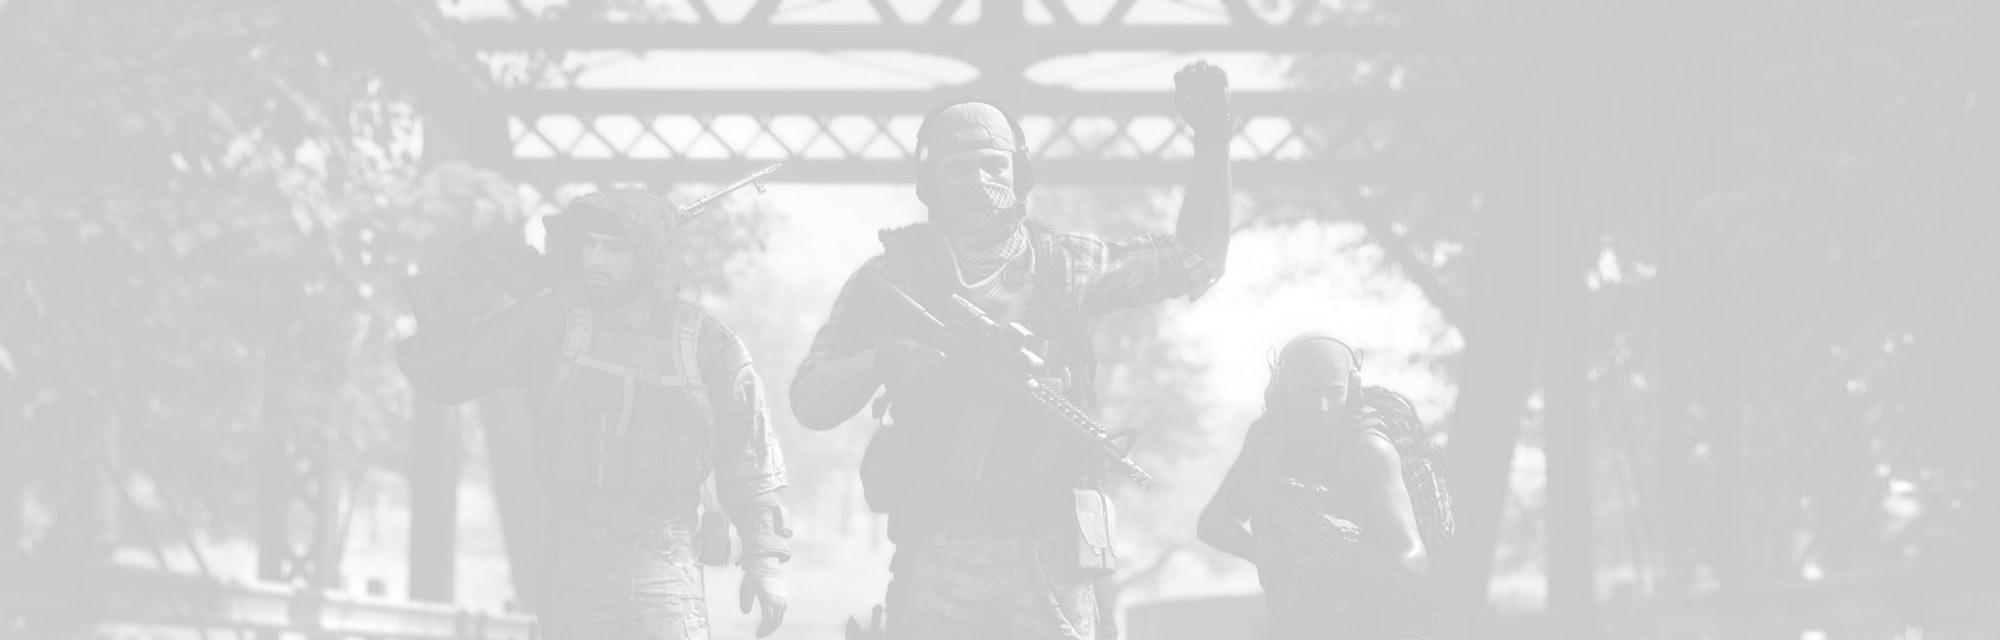 Ghost Recon Frontline Squad